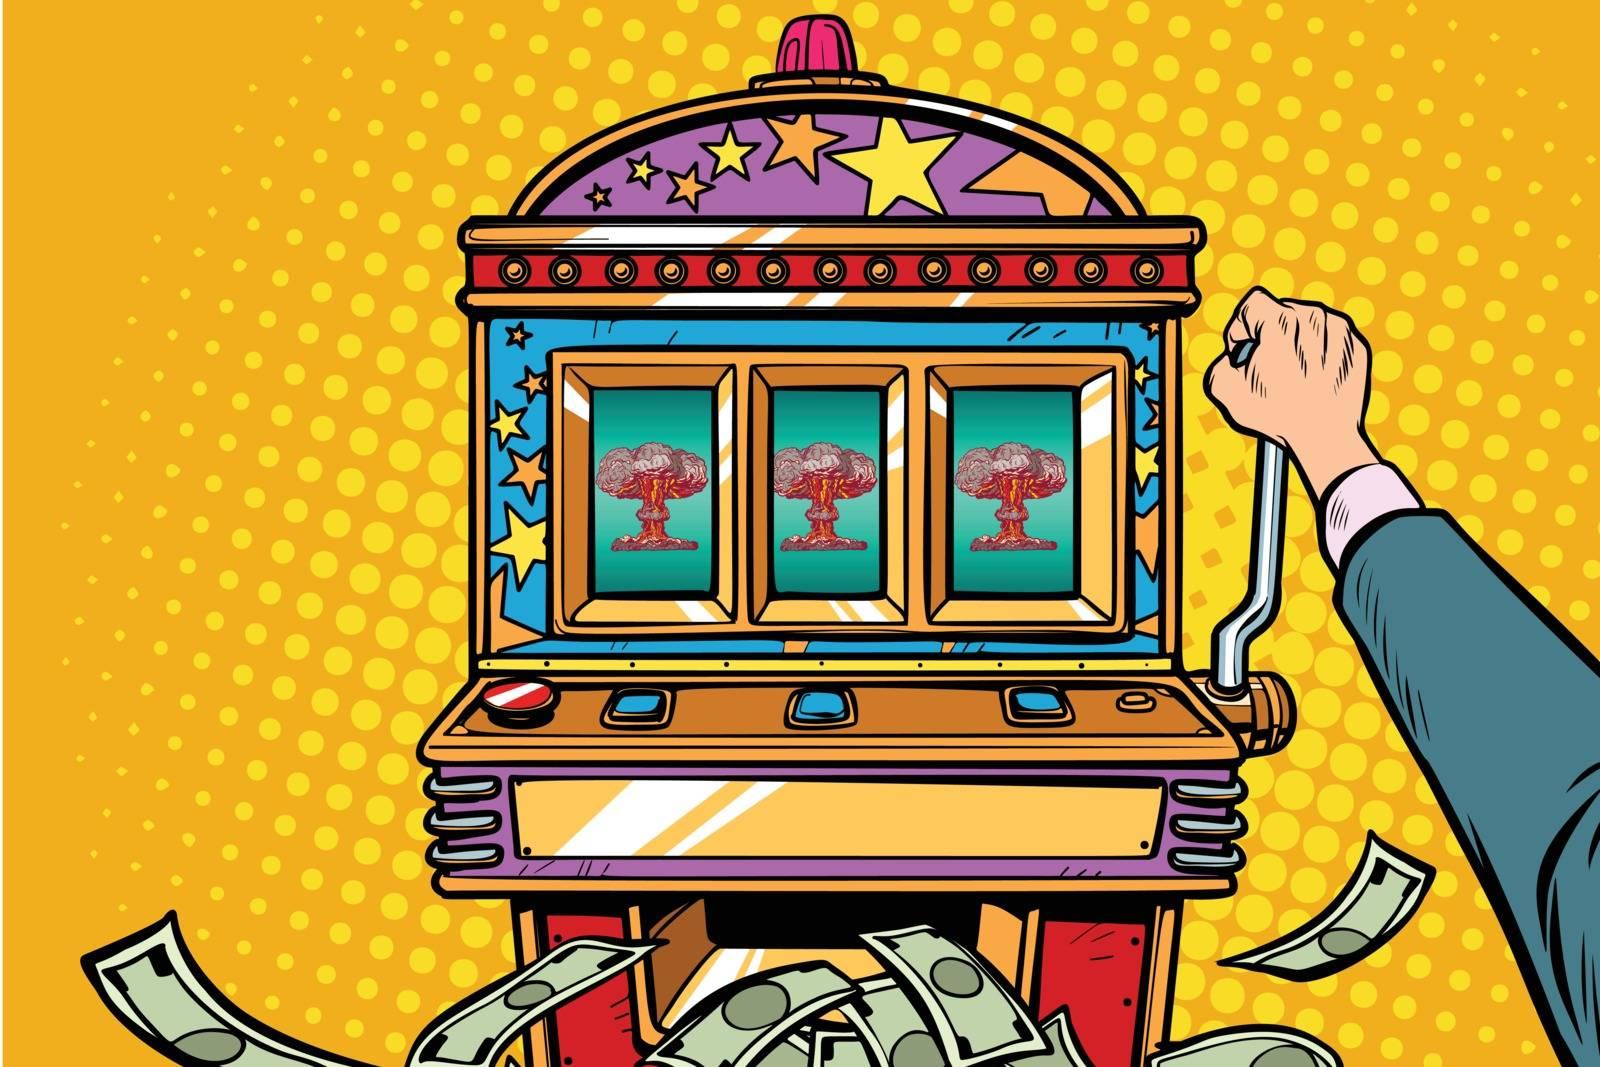 war games, aggressive politics concept. one-armed bandit slot machine. Pop art retro vector illustration vintage kitsch